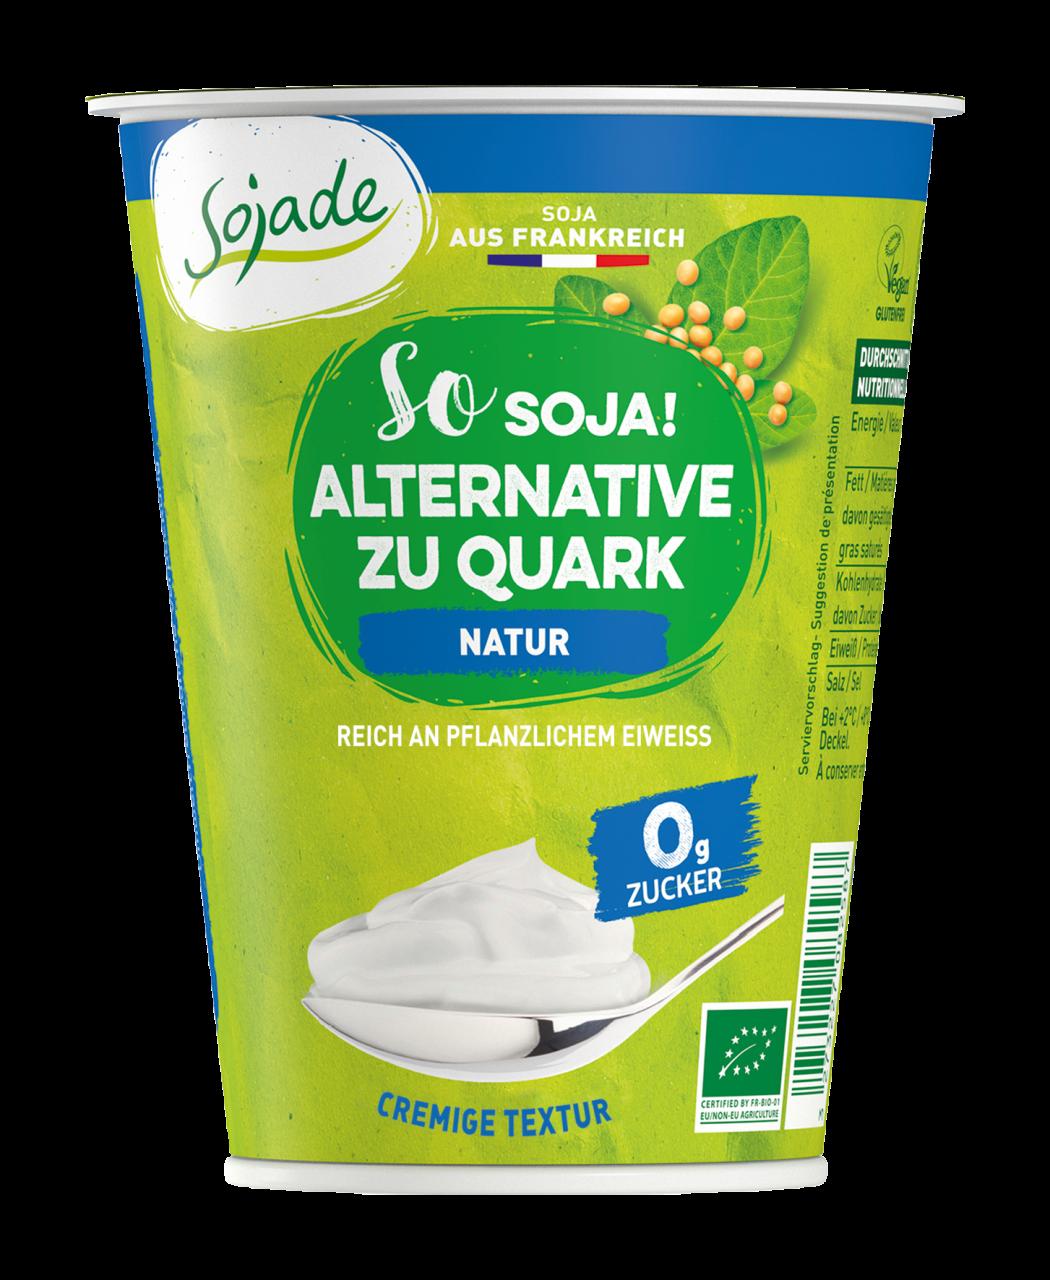 SOJADE Soja Alternative zu Quark Natur